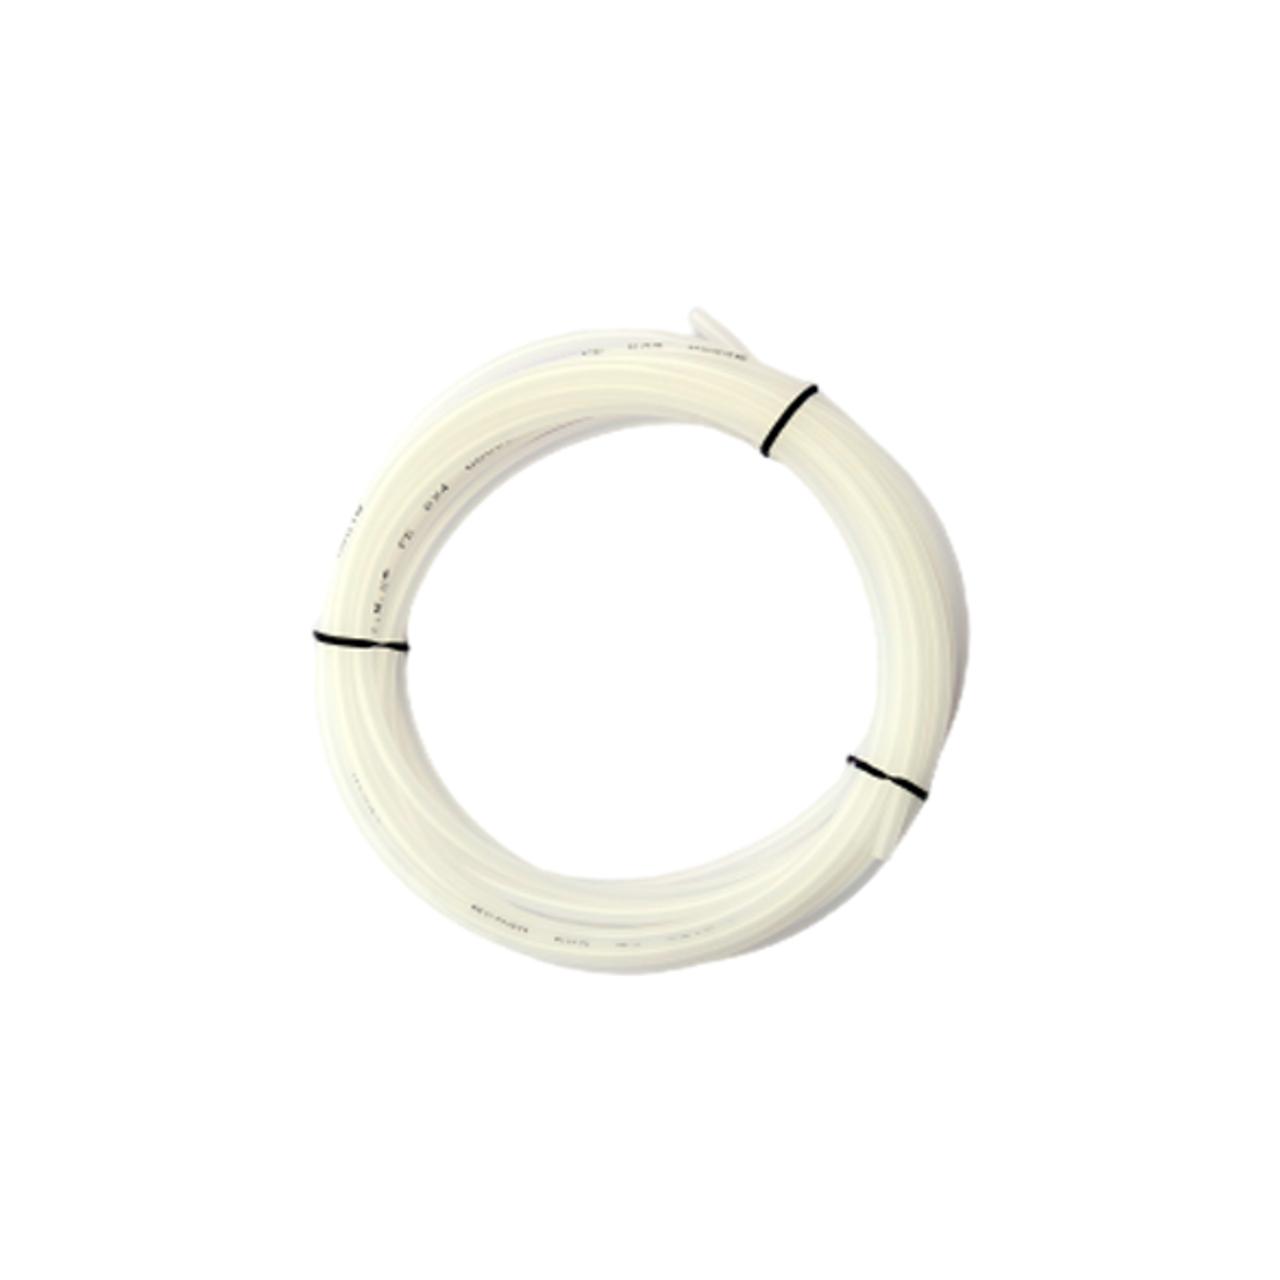 Bixpy 6mm 1/4 Polyurethane Tubing